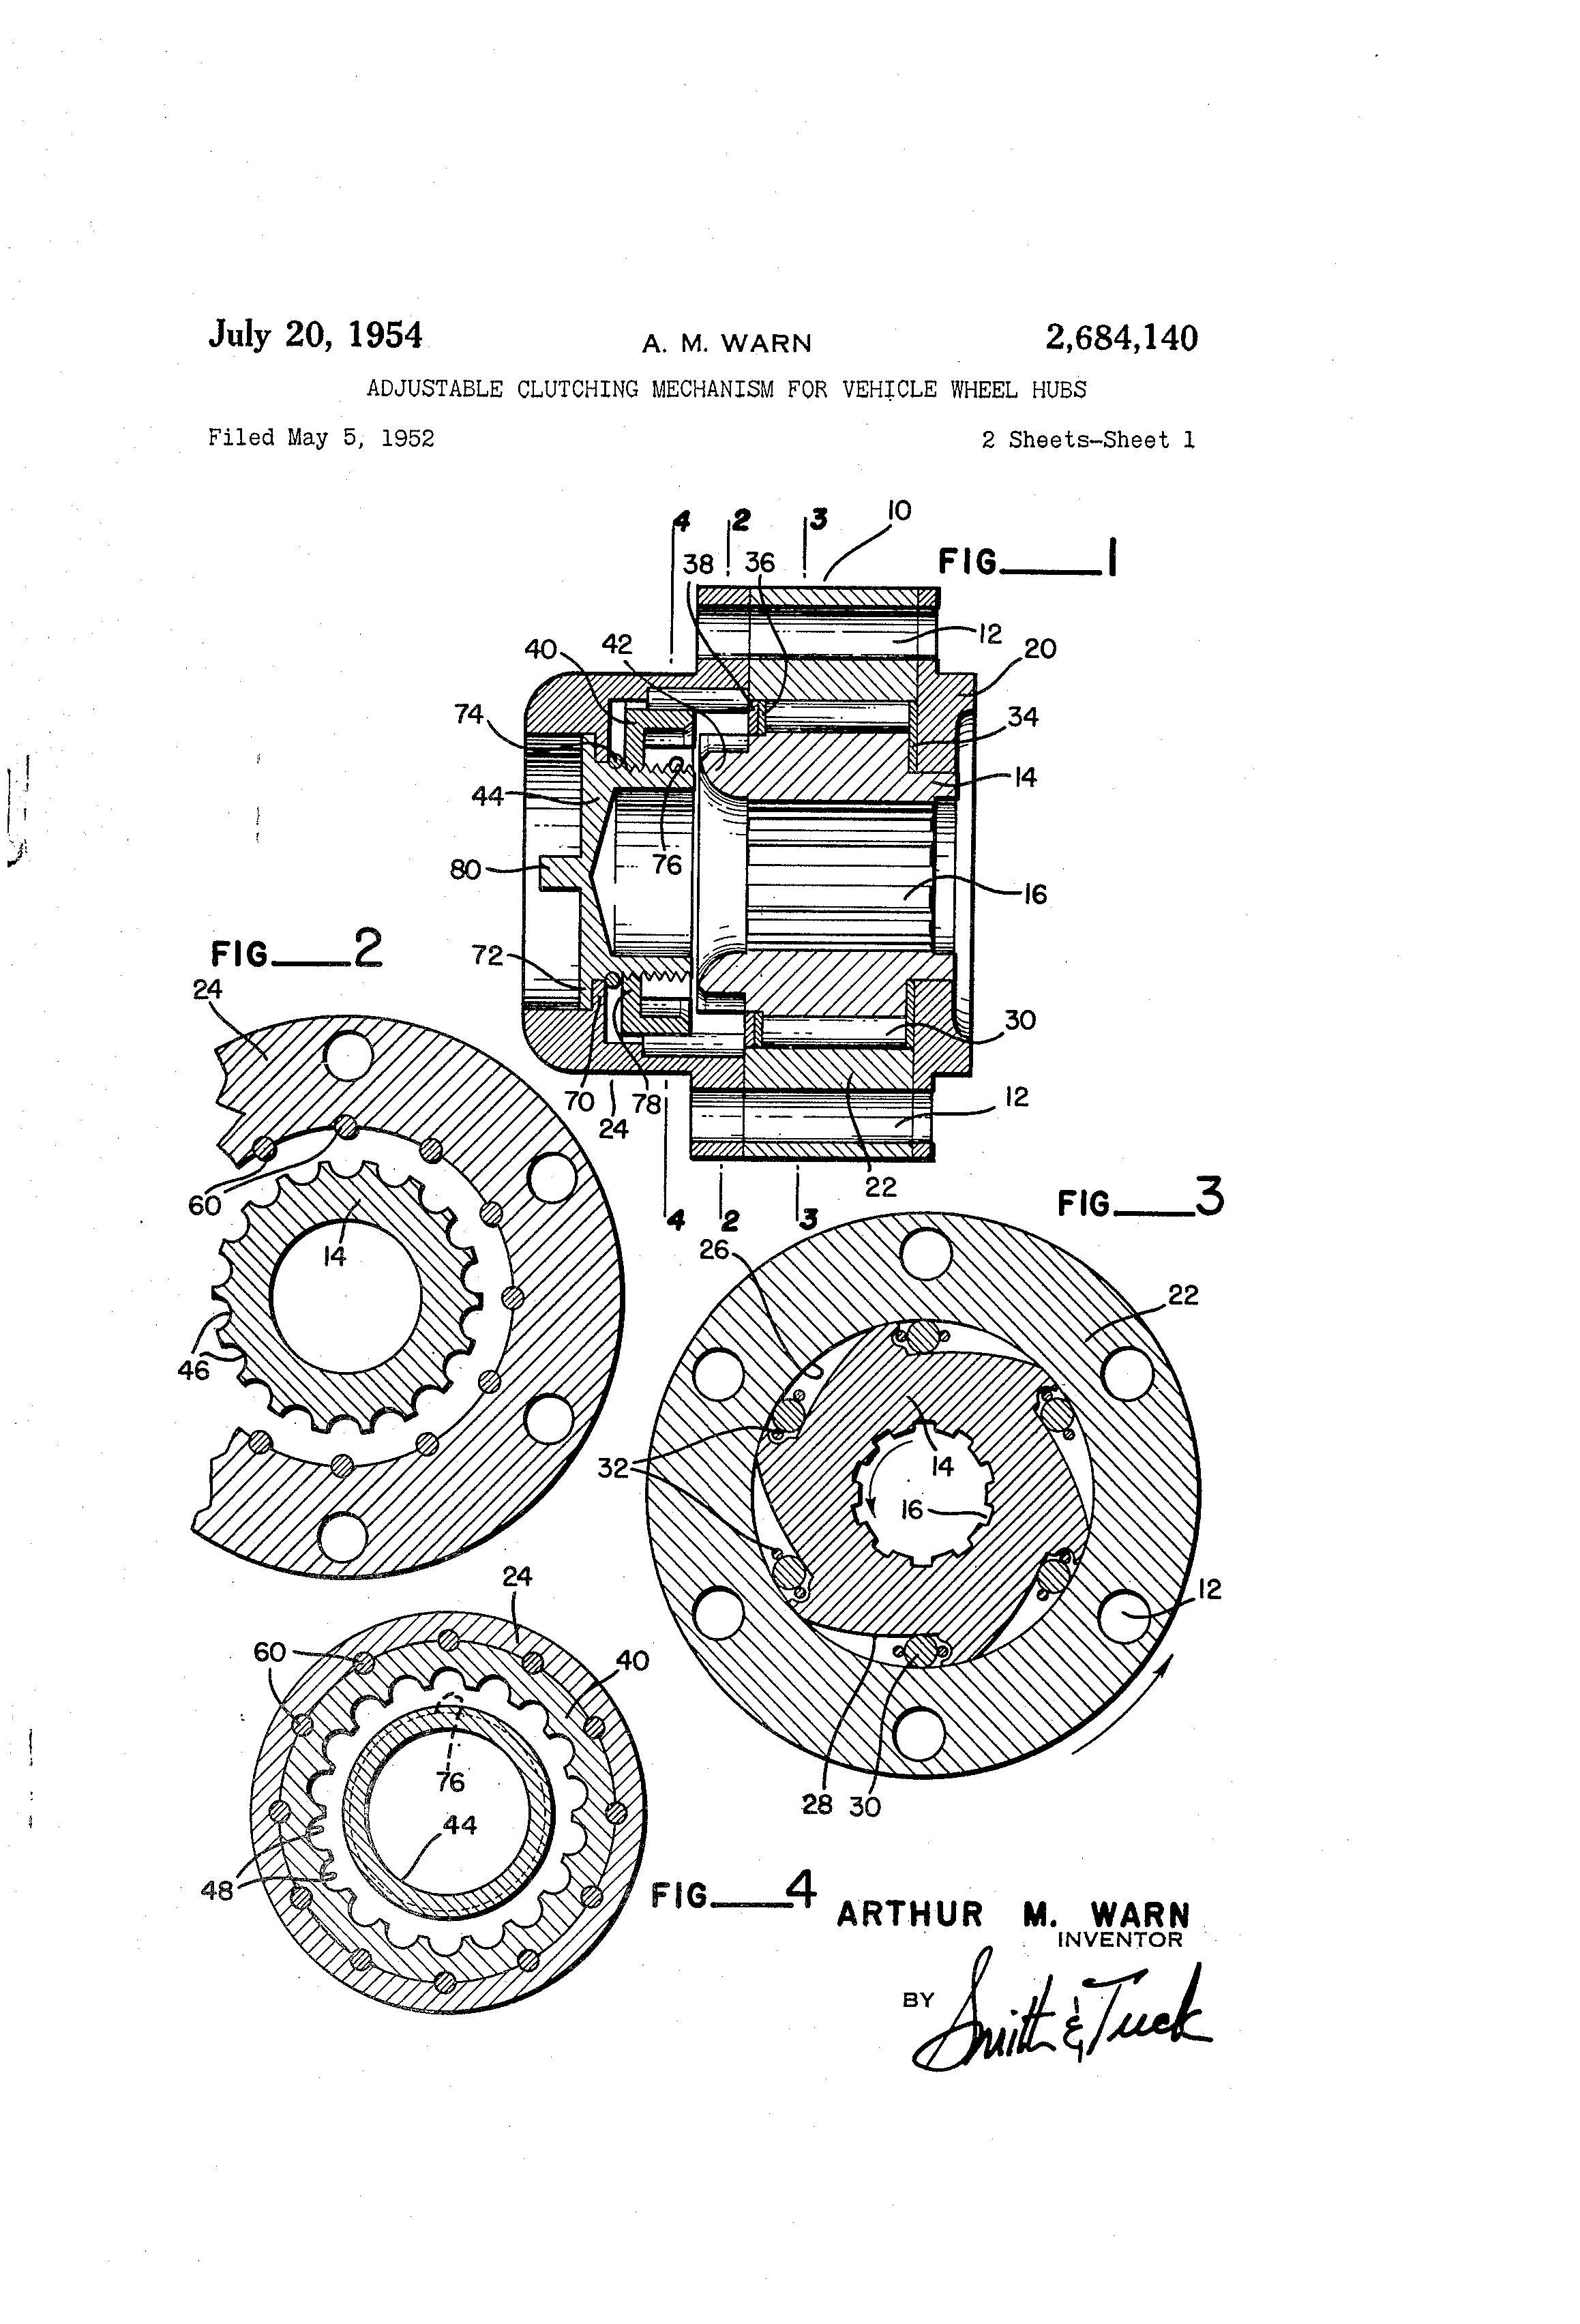 Ford F 250 Warn Manual Locking Hubs Diagram Schematic Diagrams Hub Assembly Lockout Illustration Of Wiring U2022